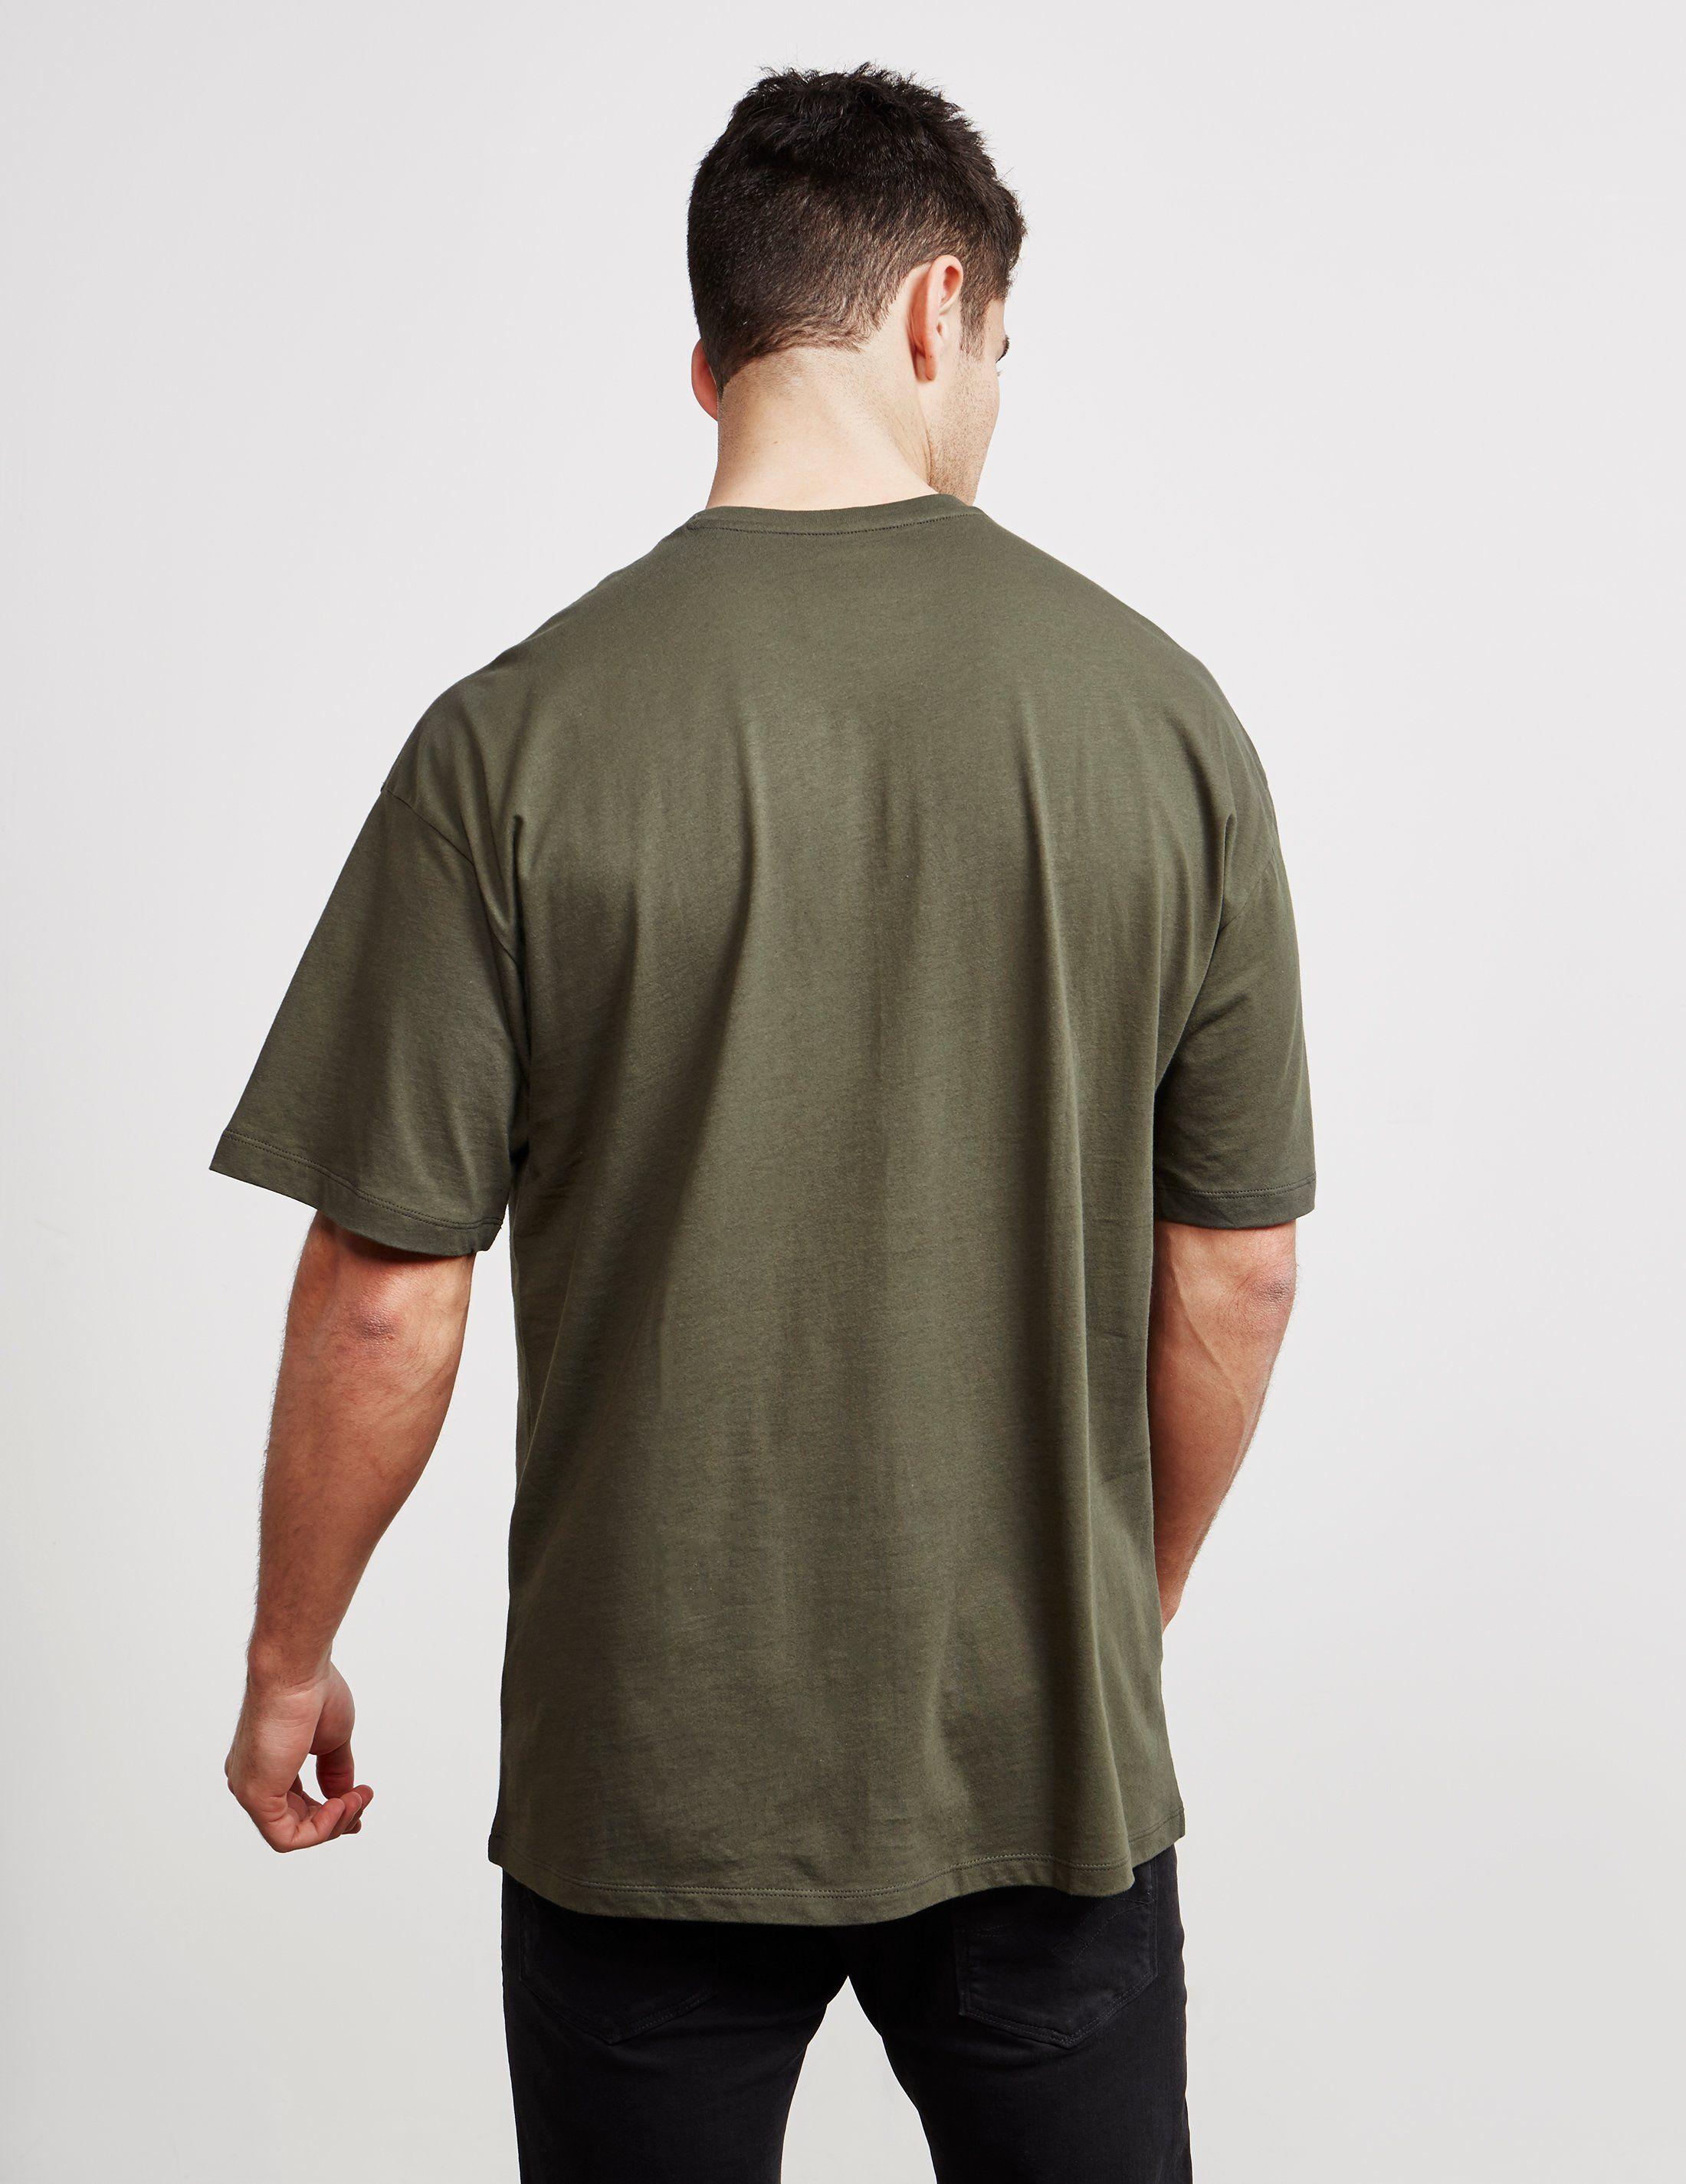 Armani Exchange Mountain Box Short Sleeve T-Shirt